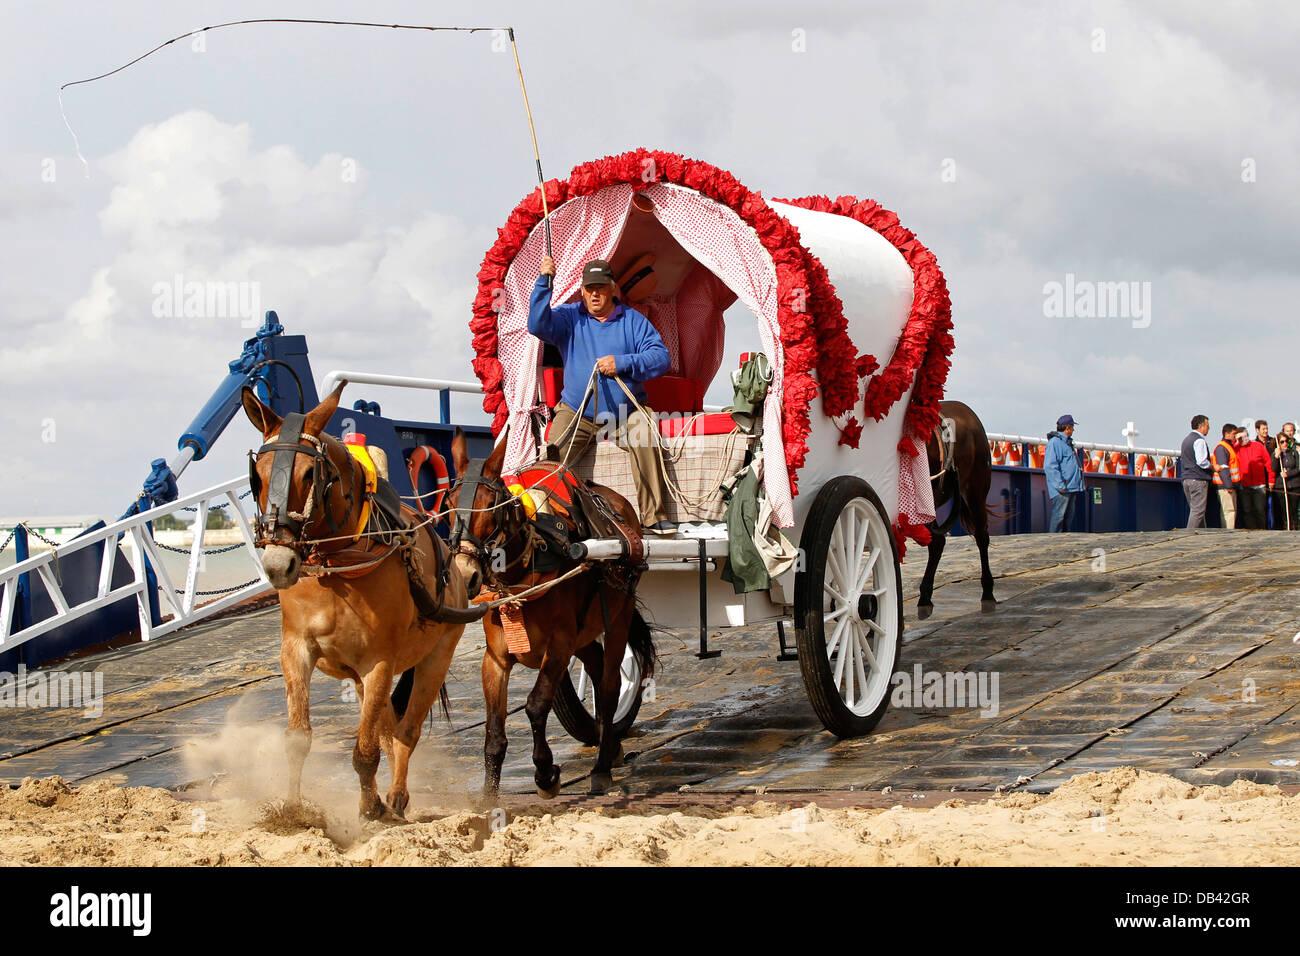 Traditional Spanish gypsy horse-drawn caravan, making the pilgrimage to El Rocio, arrive at the Donana National - Stock Image